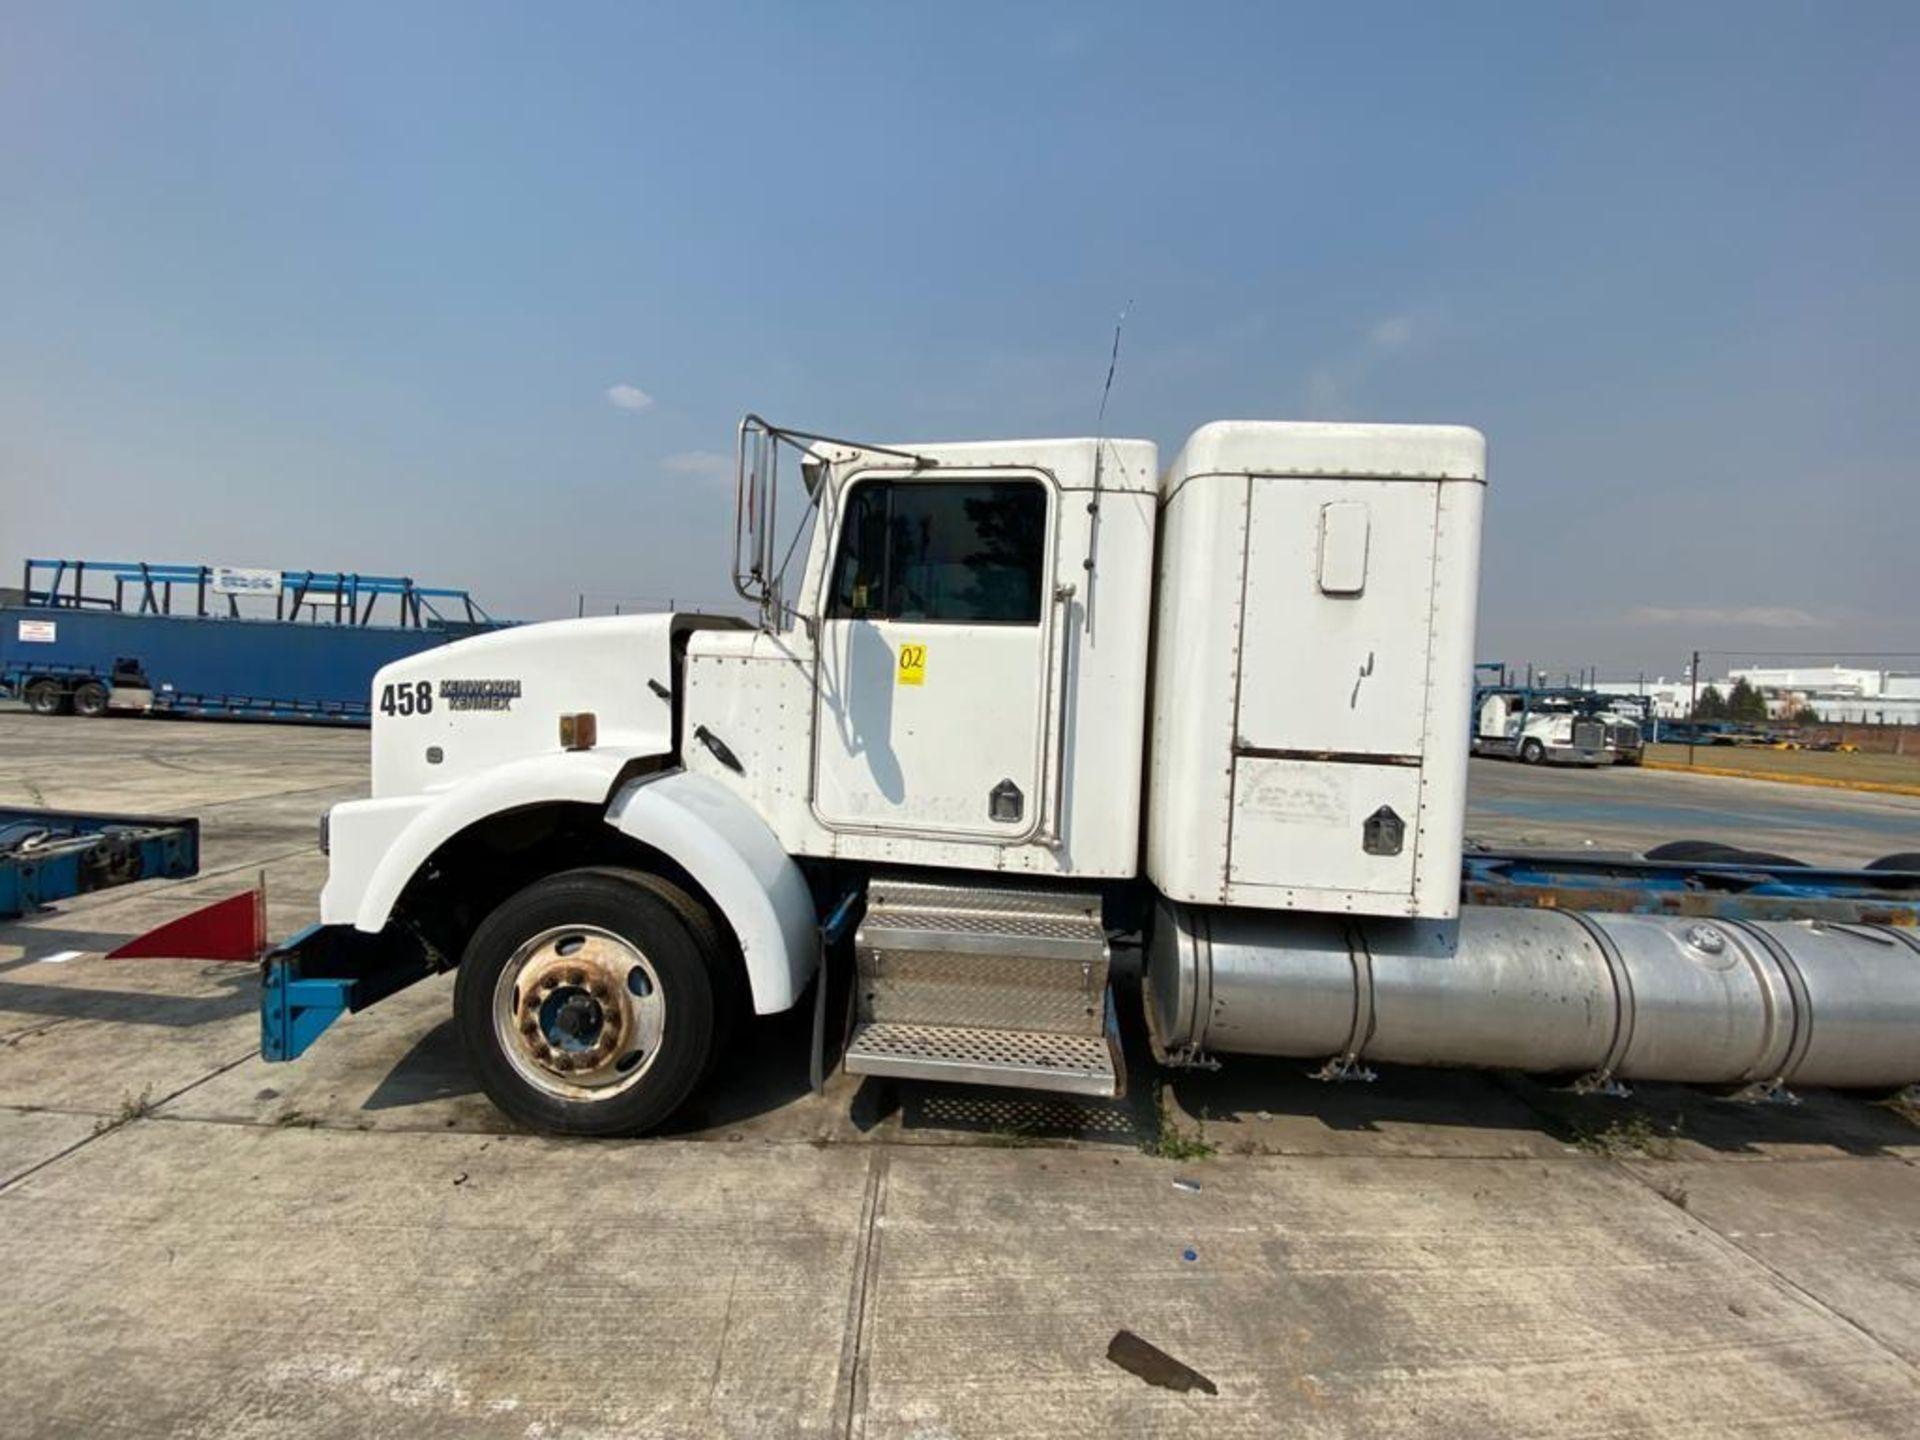 1999 Kenworth Sleeper truck tractor, standard transmission of 18 speeds - Image 11 of 75